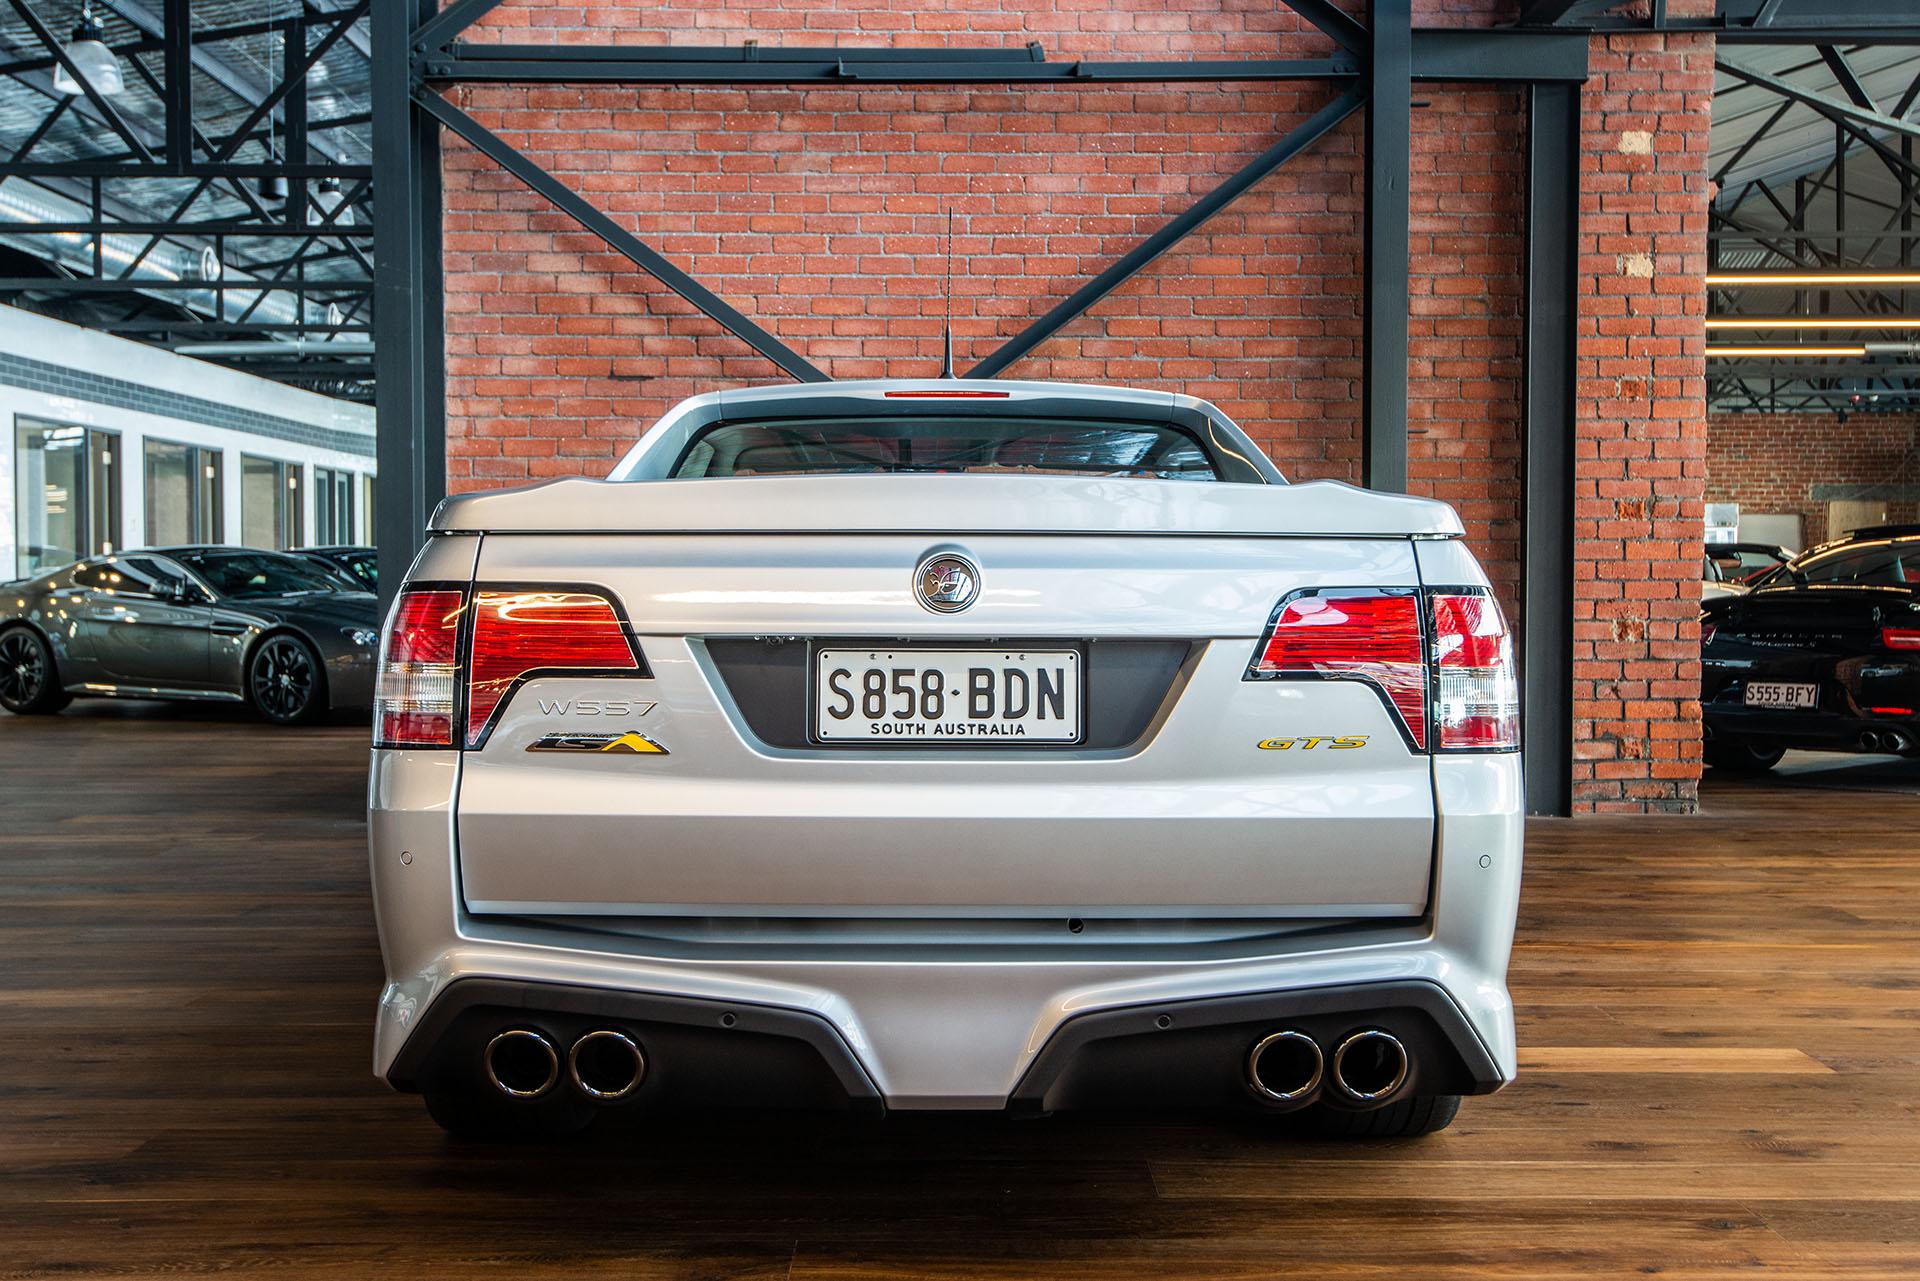 2015 HSV GTS Maloo W557 - Richmonds - Classic and Prestige Cars